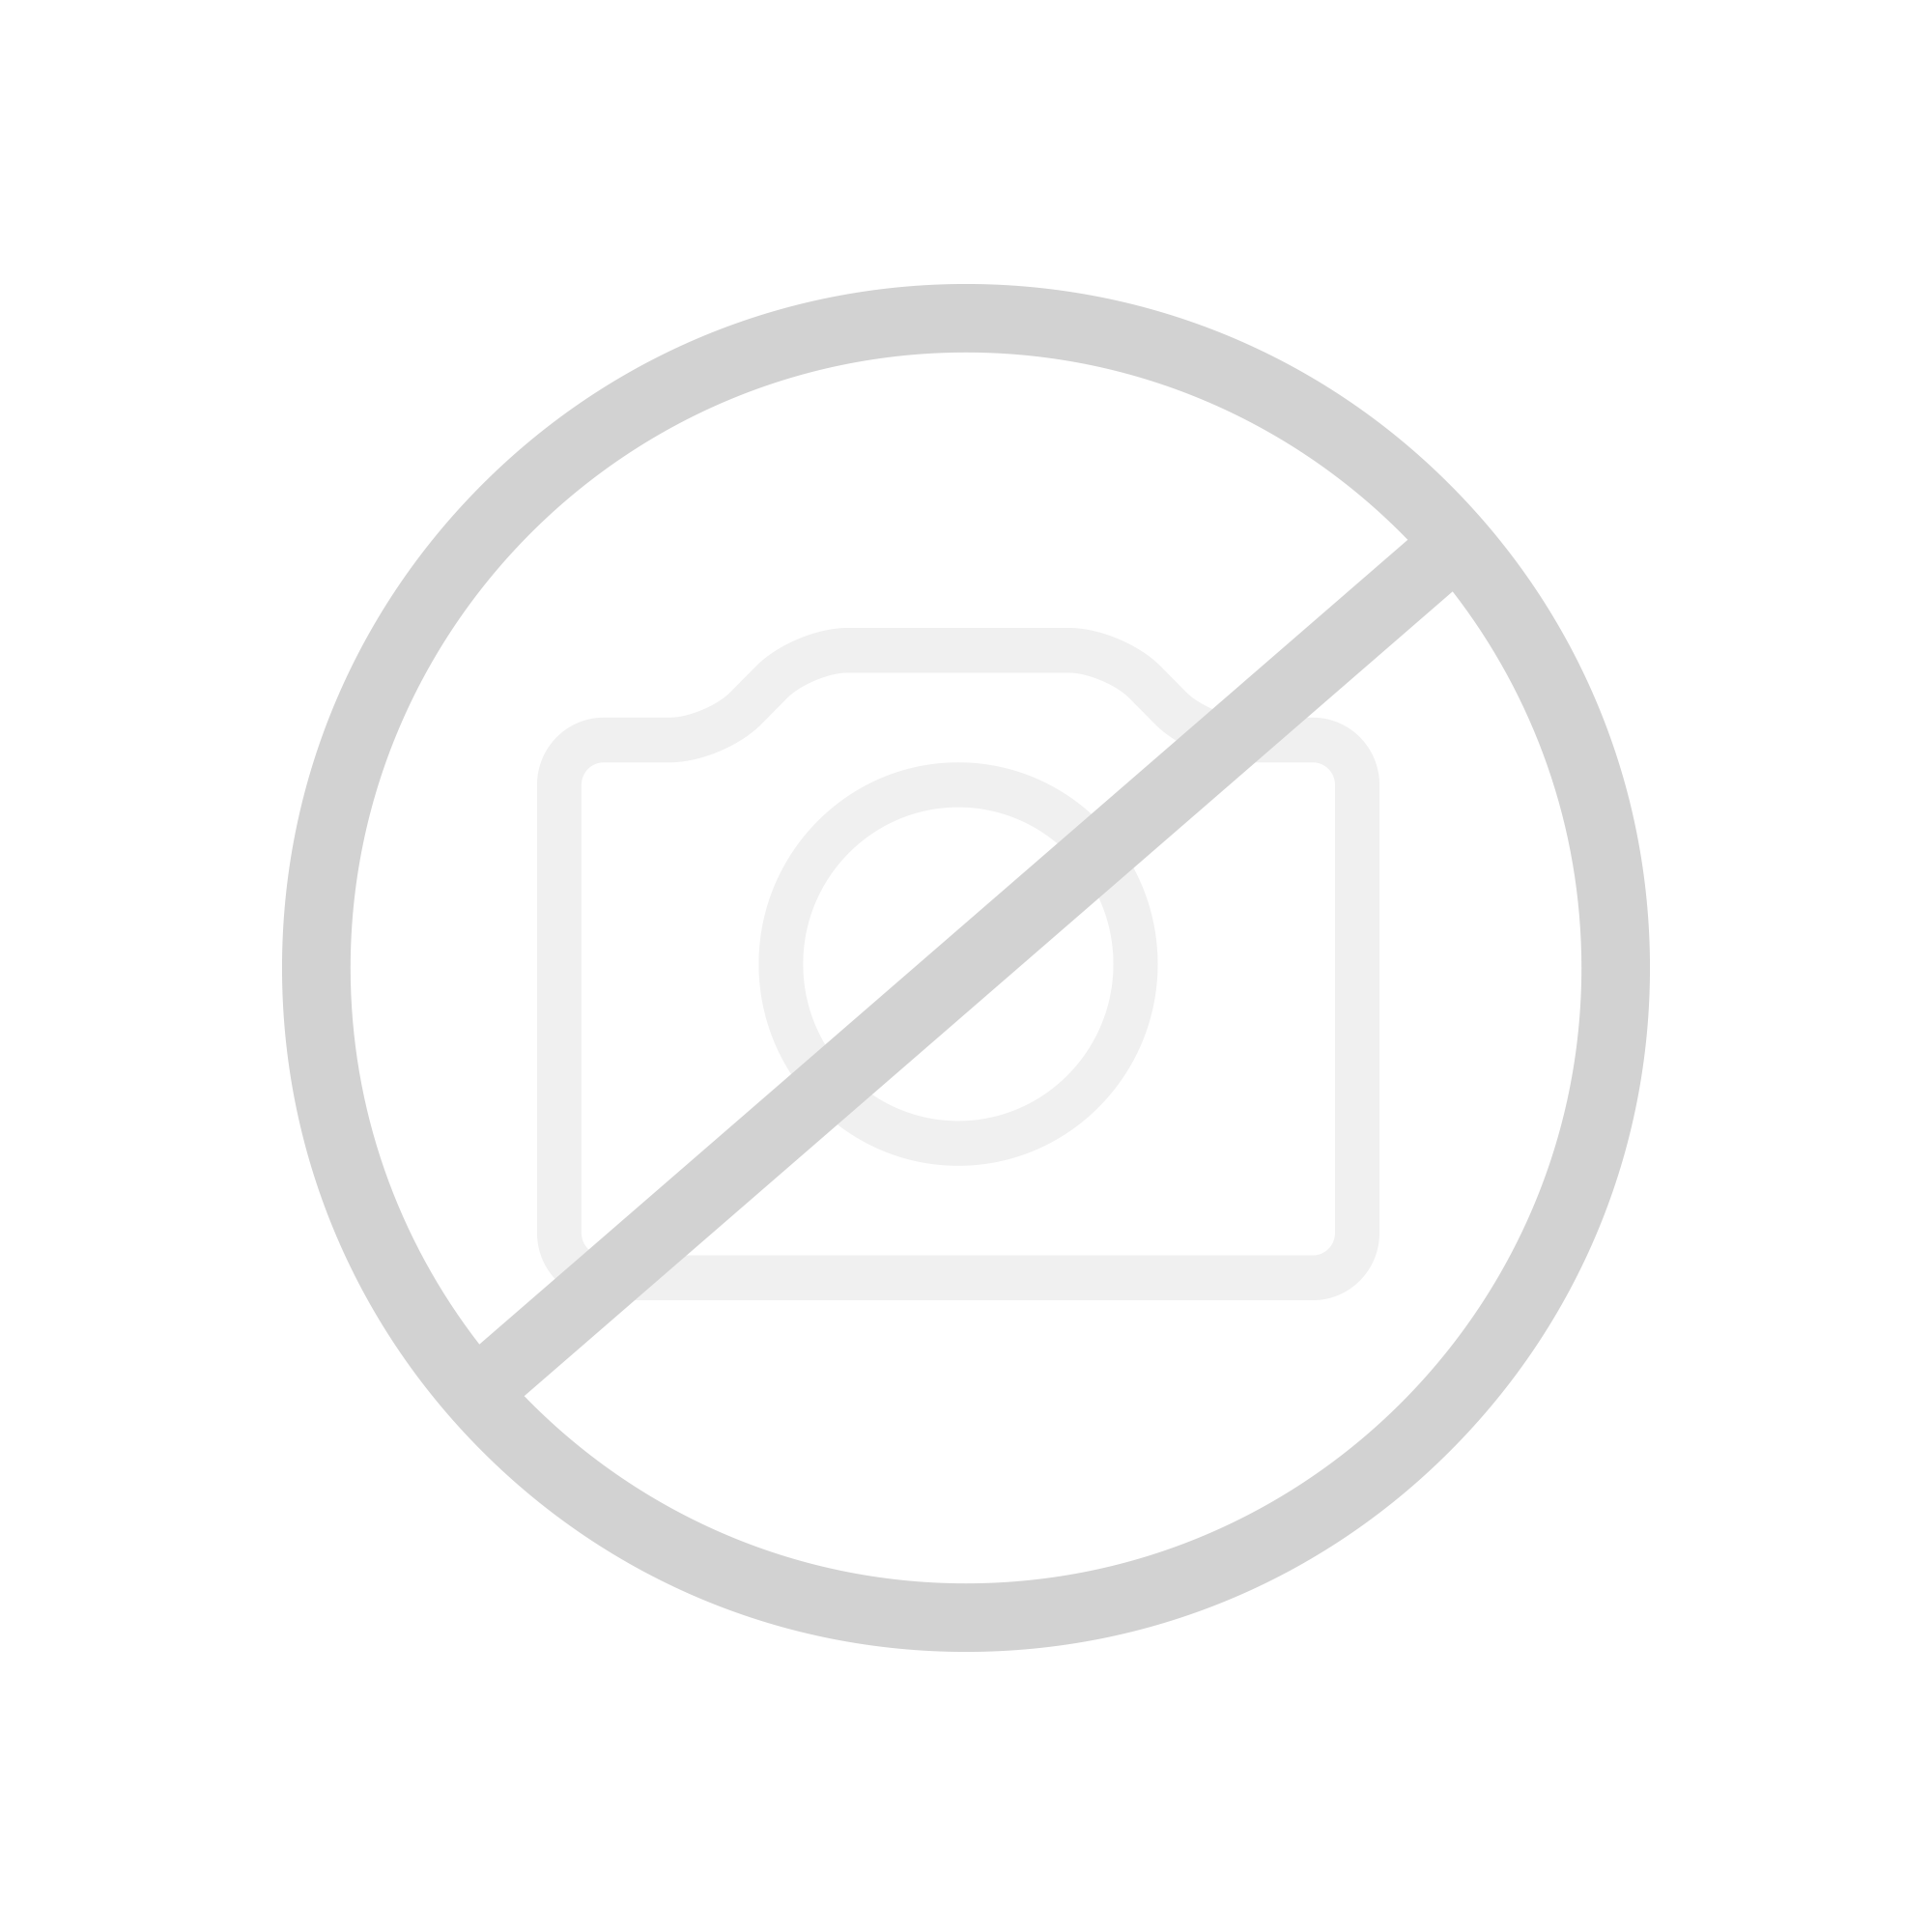 geberit duofix wand wc montageelement f r geruchsabsaugung 112 cm mit up spk up320. Black Bedroom Furniture Sets. Home Design Ideas